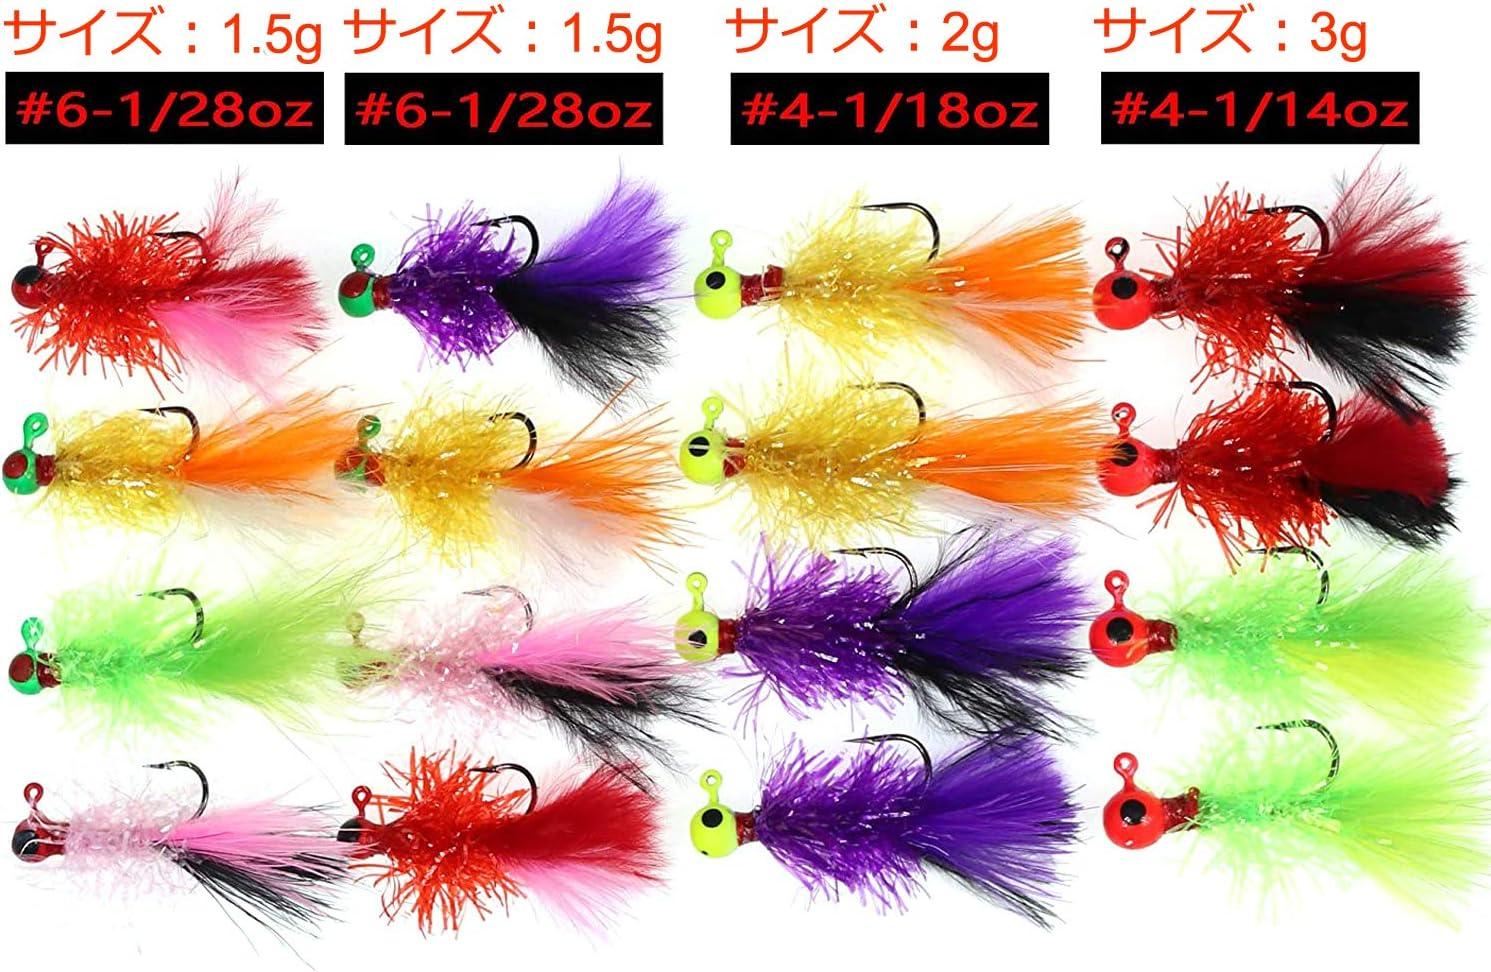 With NITRO Gems Premium Marabou Jigs 1//8 oz Fishing Crappie Jigs1 Pack Of 10